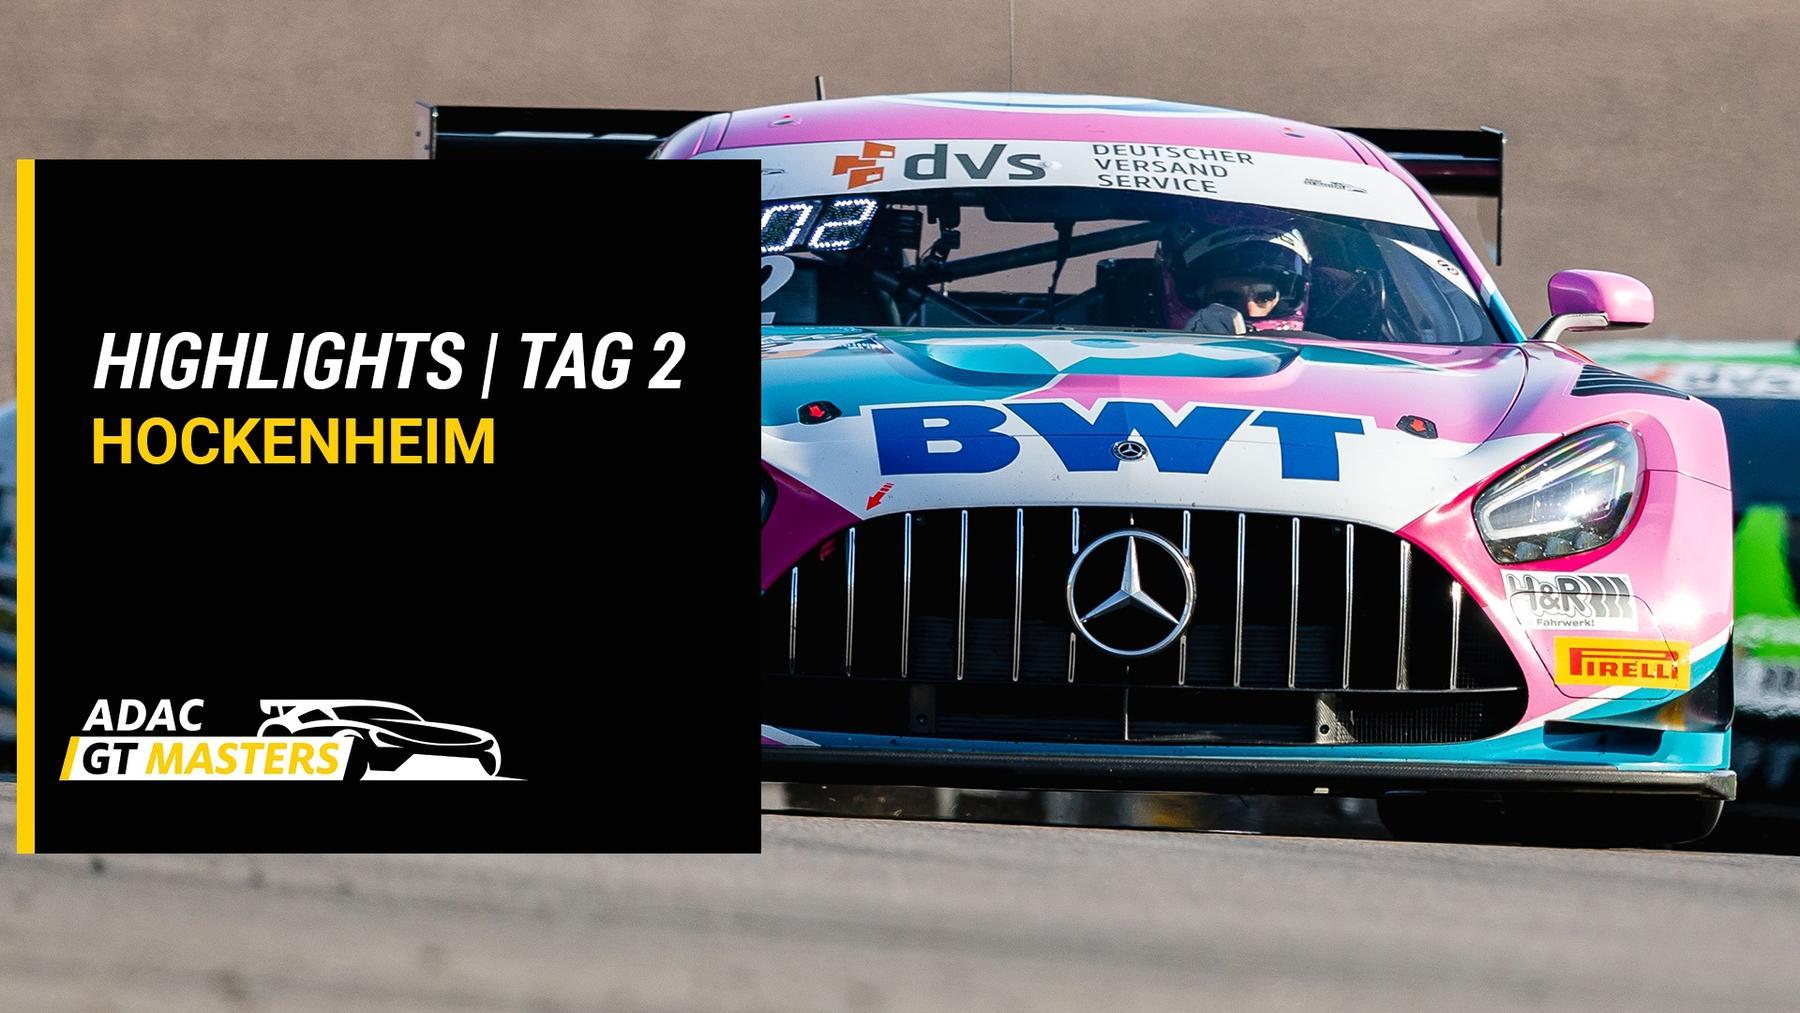 ADAC GT Masters - Highlights - Hockenheim - Tag 2